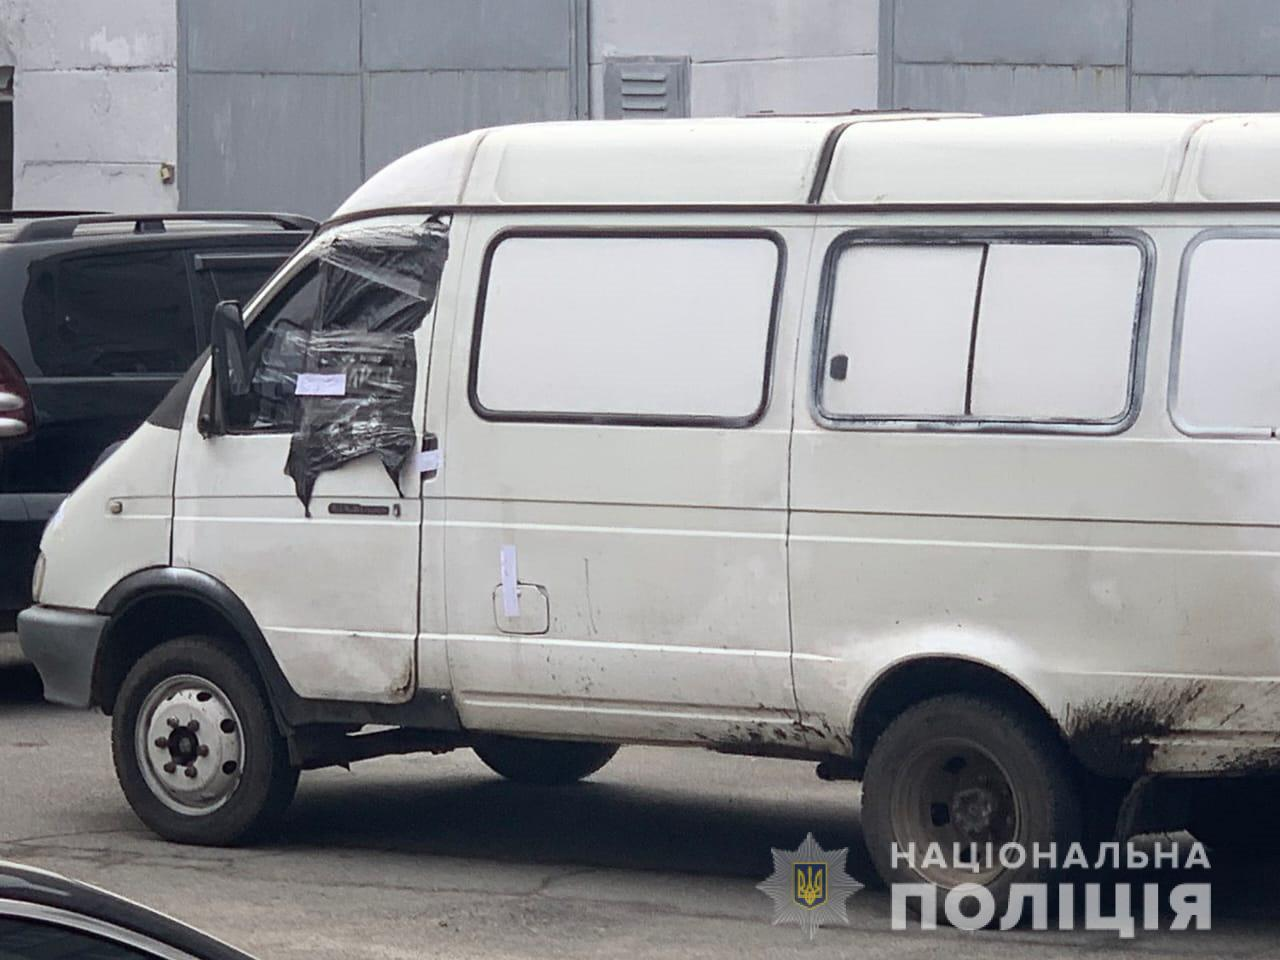 В Днепре полицейского протащили на капоте микроавтобуса. Новости Днепра